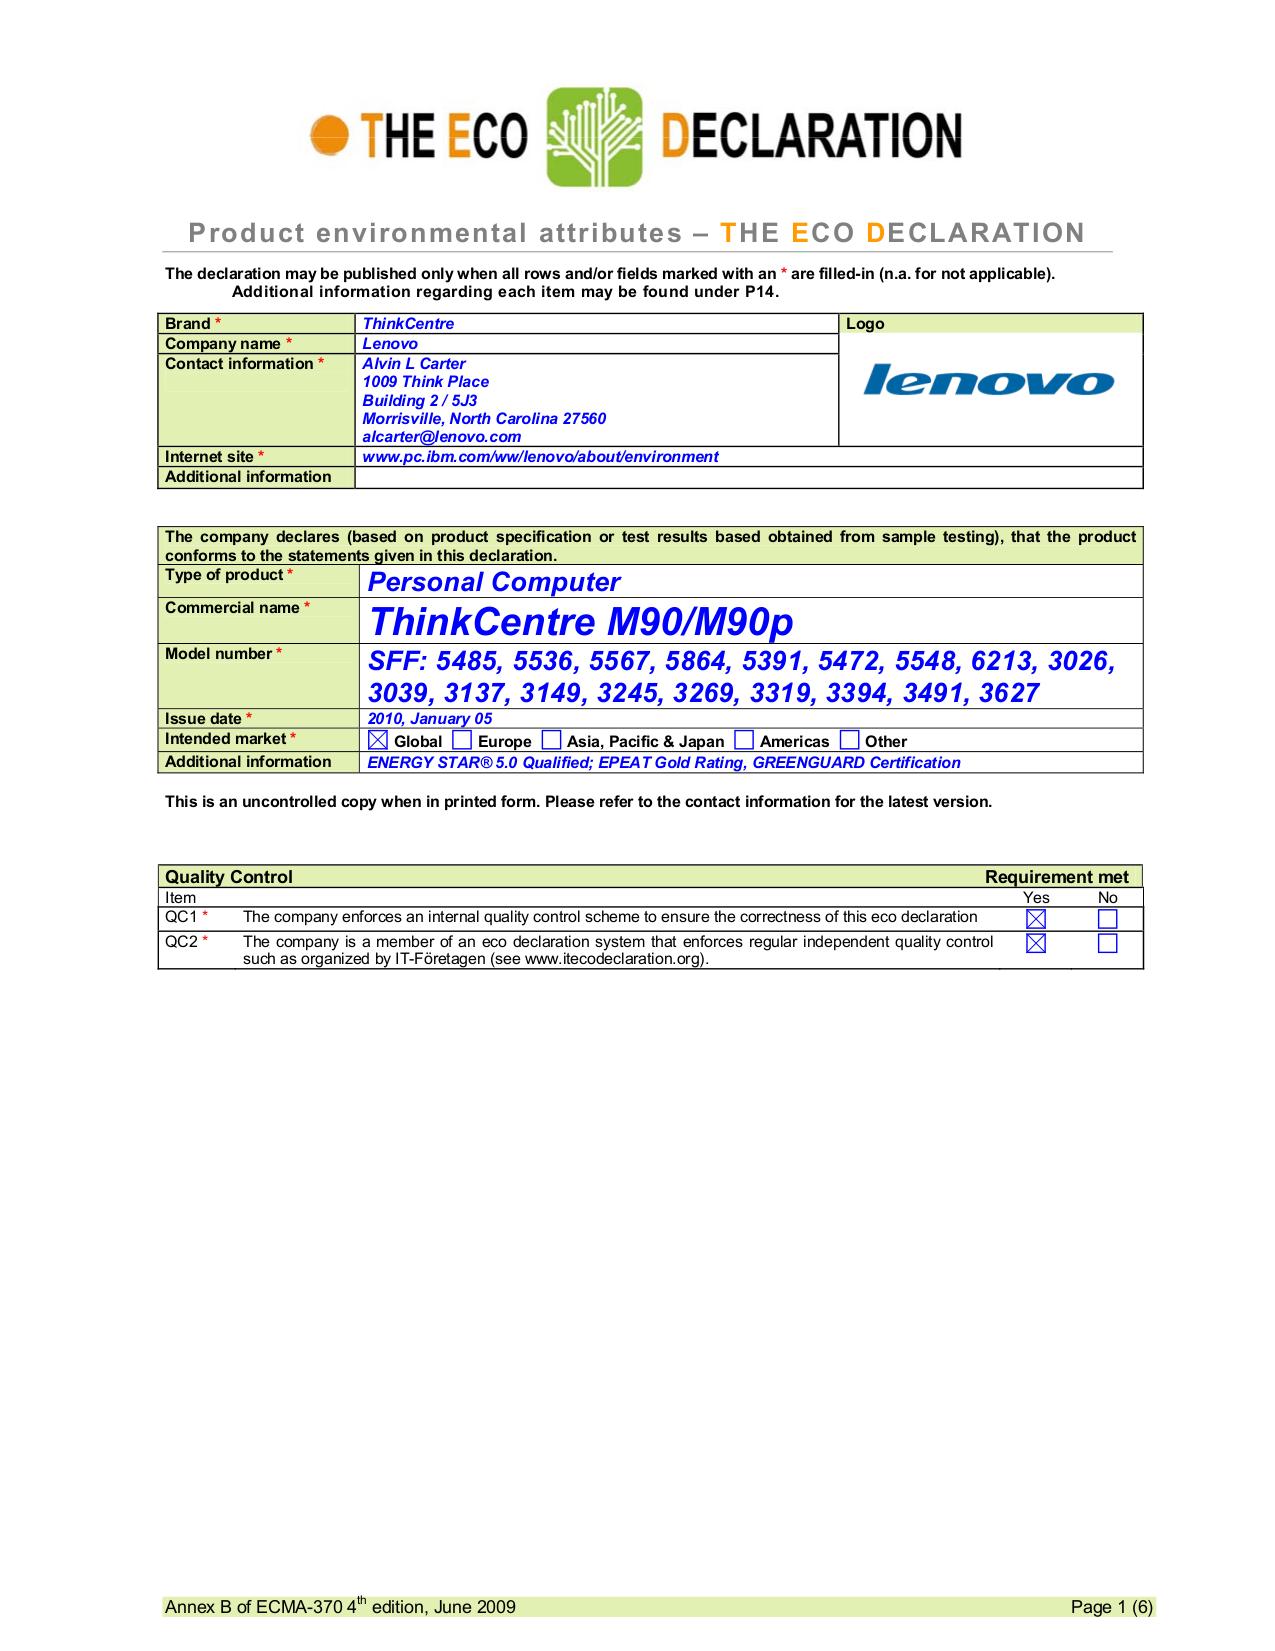 pdf for Lenovo Desktop ThinkCentre M90 3245 manual